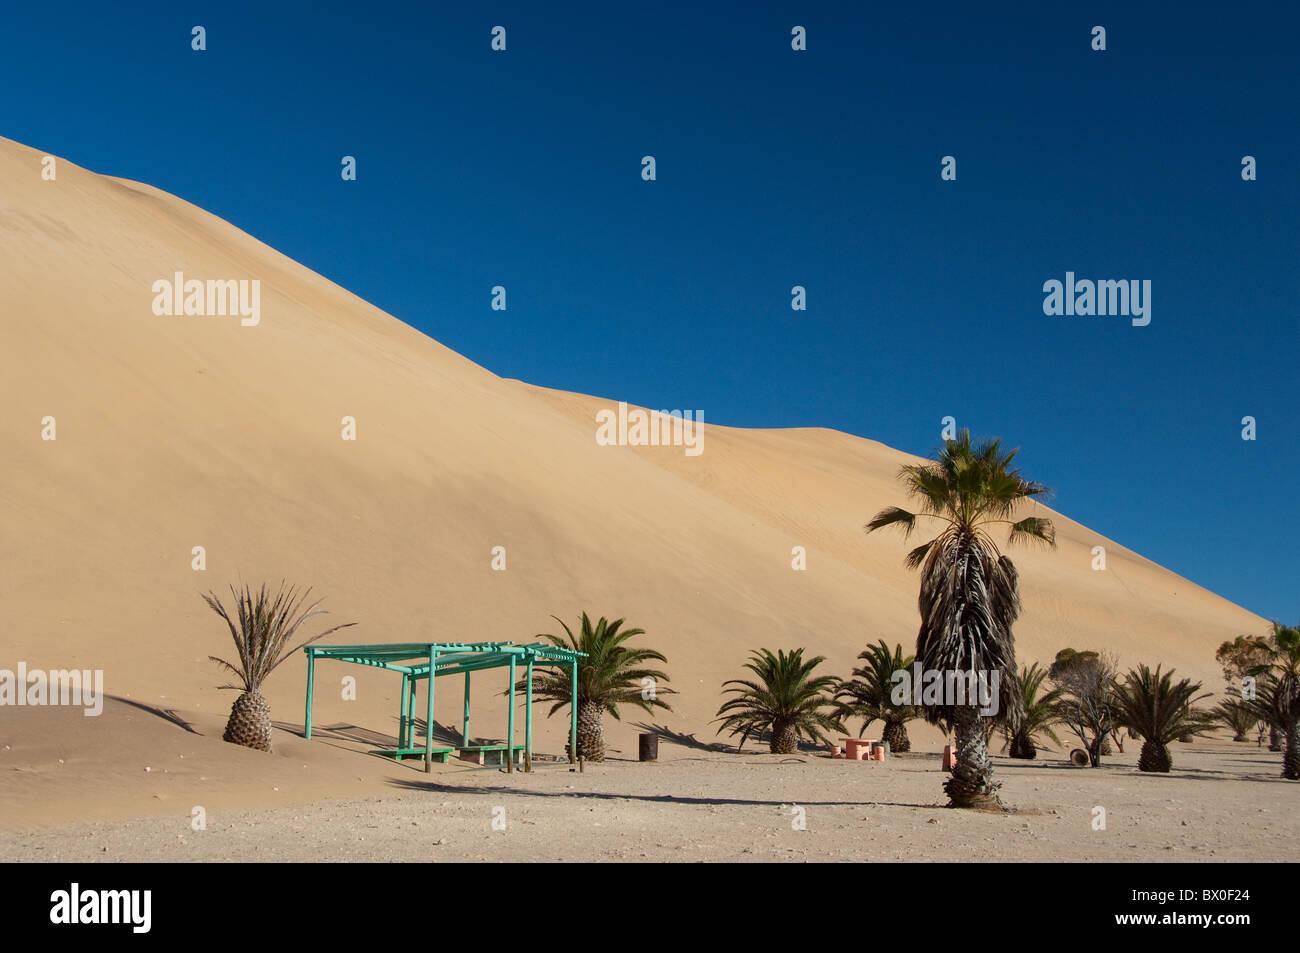 Africa, Namibia, Walvis Bay, Namib Desert. Coastal sand dunes between Walvis Bay & Swakopmund, famous Dune 7. - Stock Image